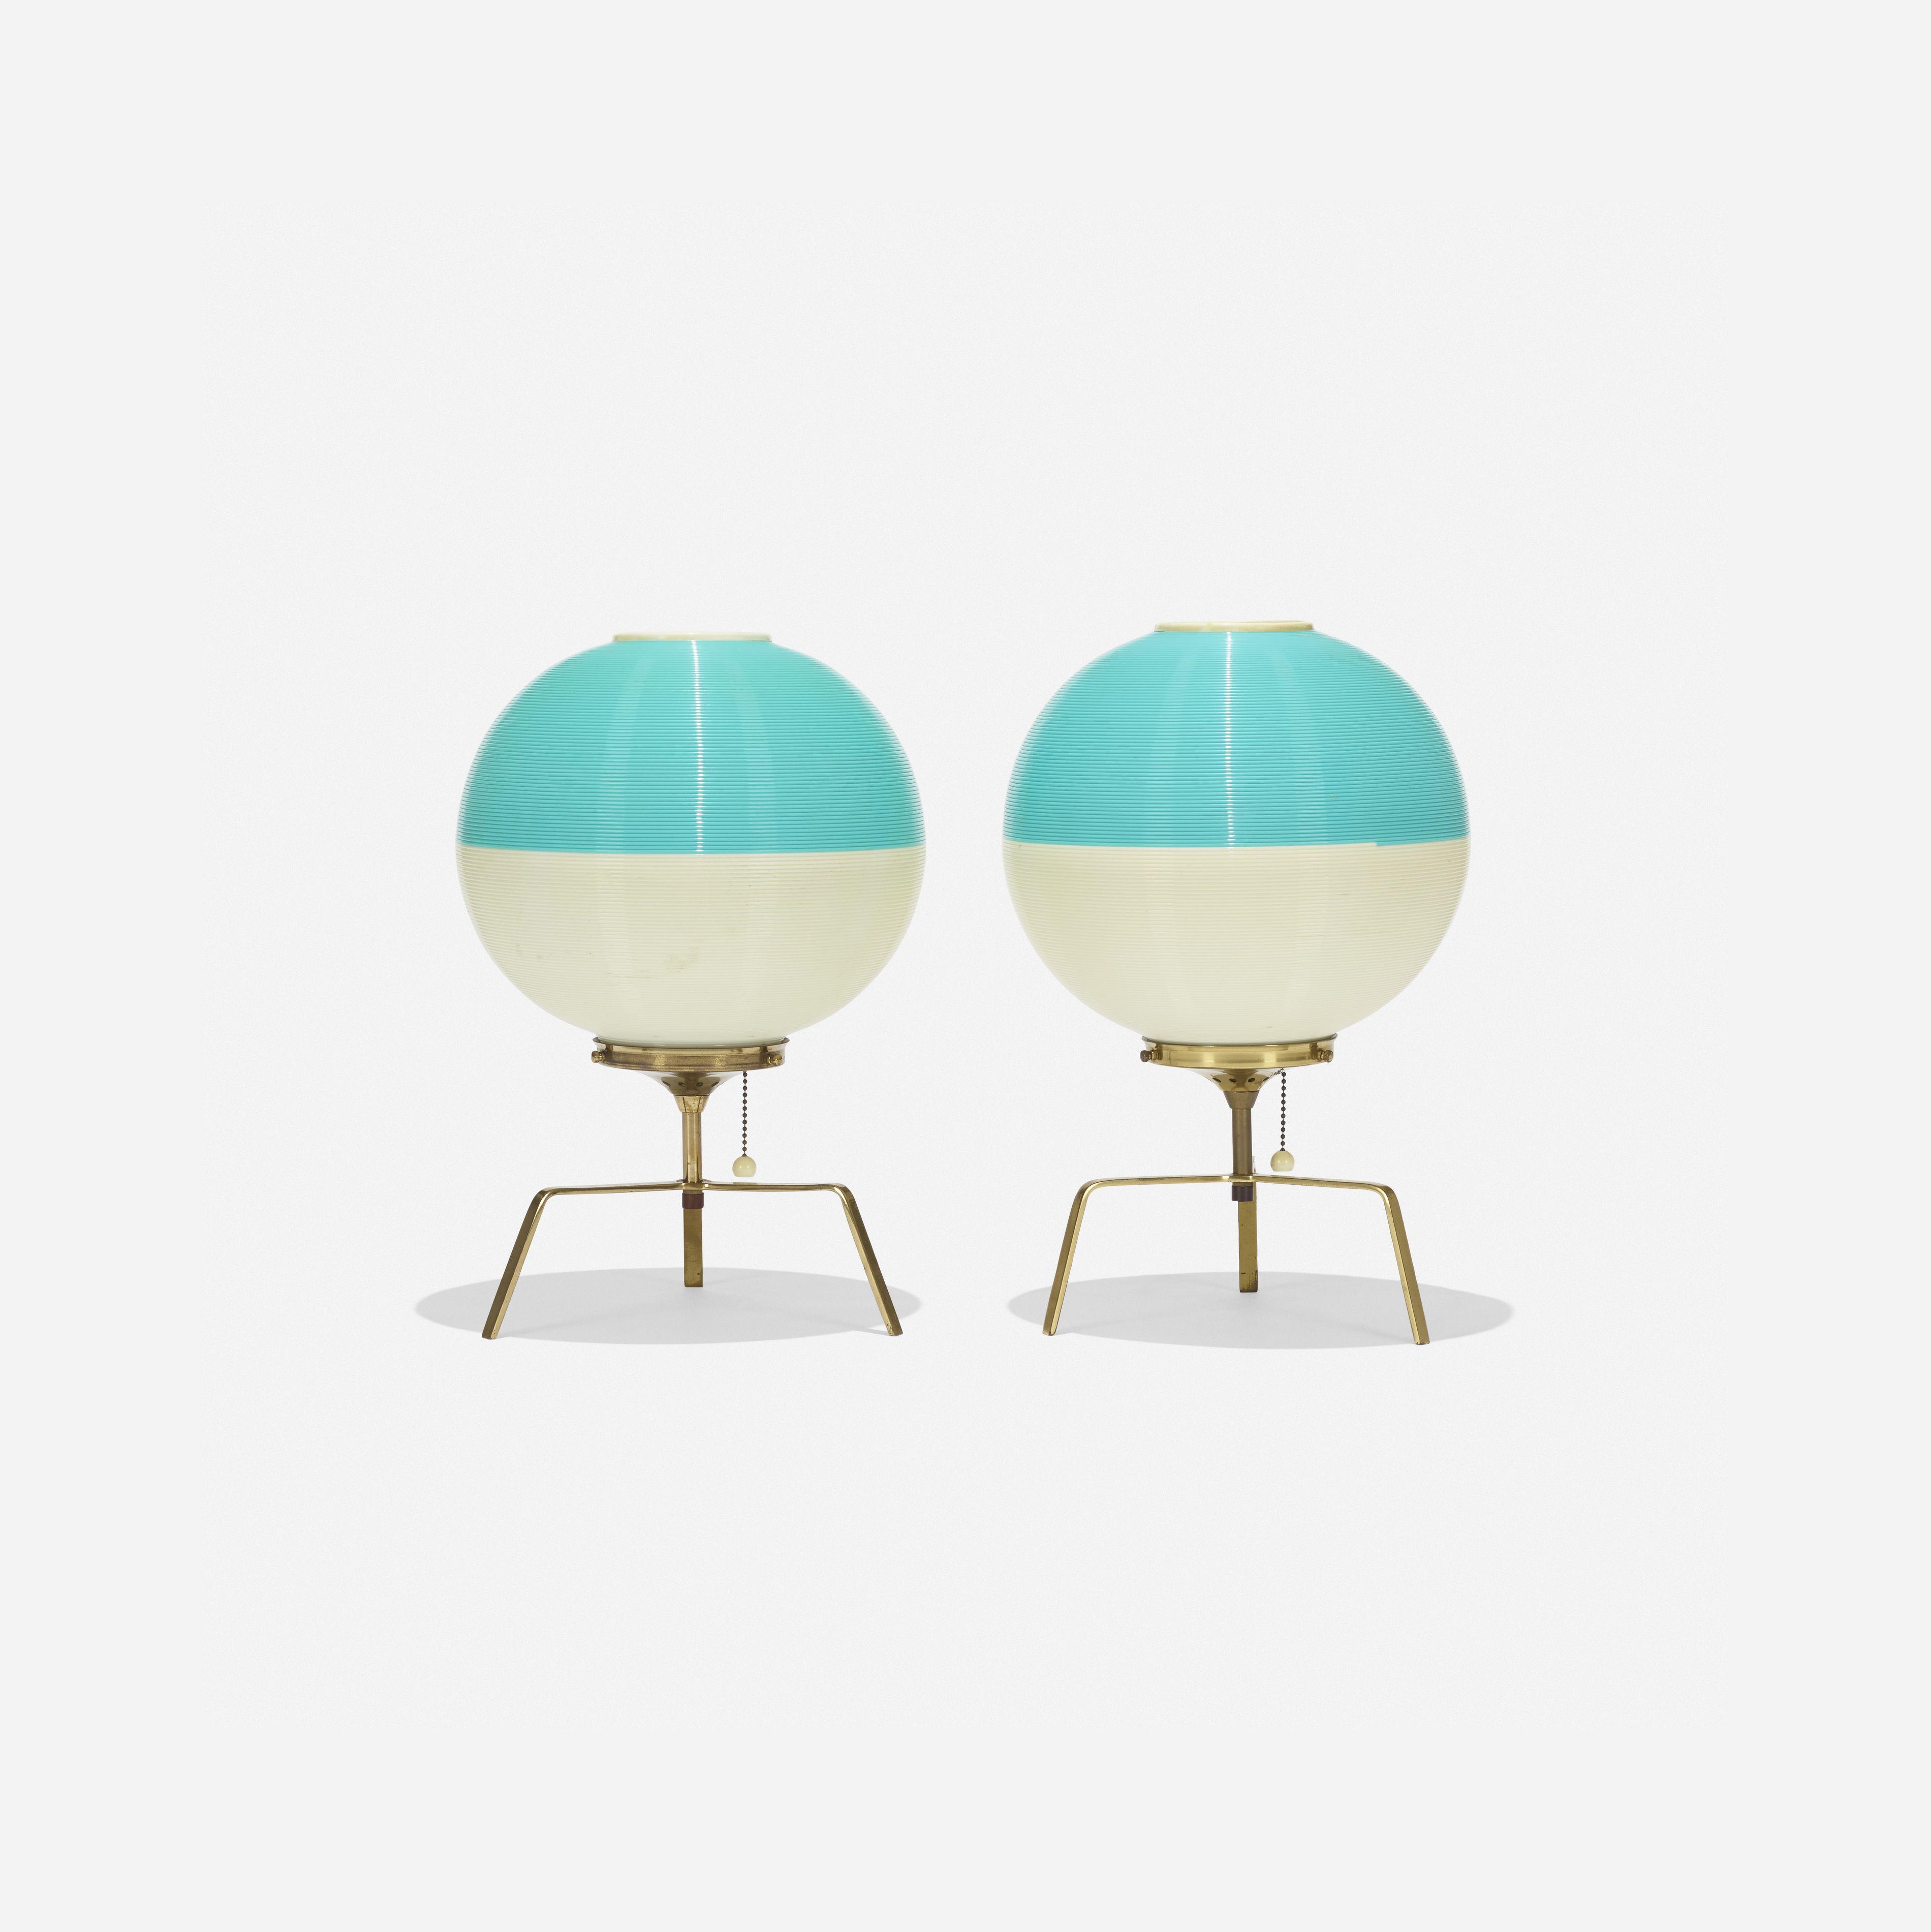 Lot 140: Yasha Heifetz. Rotaflex table lamps, pair. c. 1955, brass, molded…